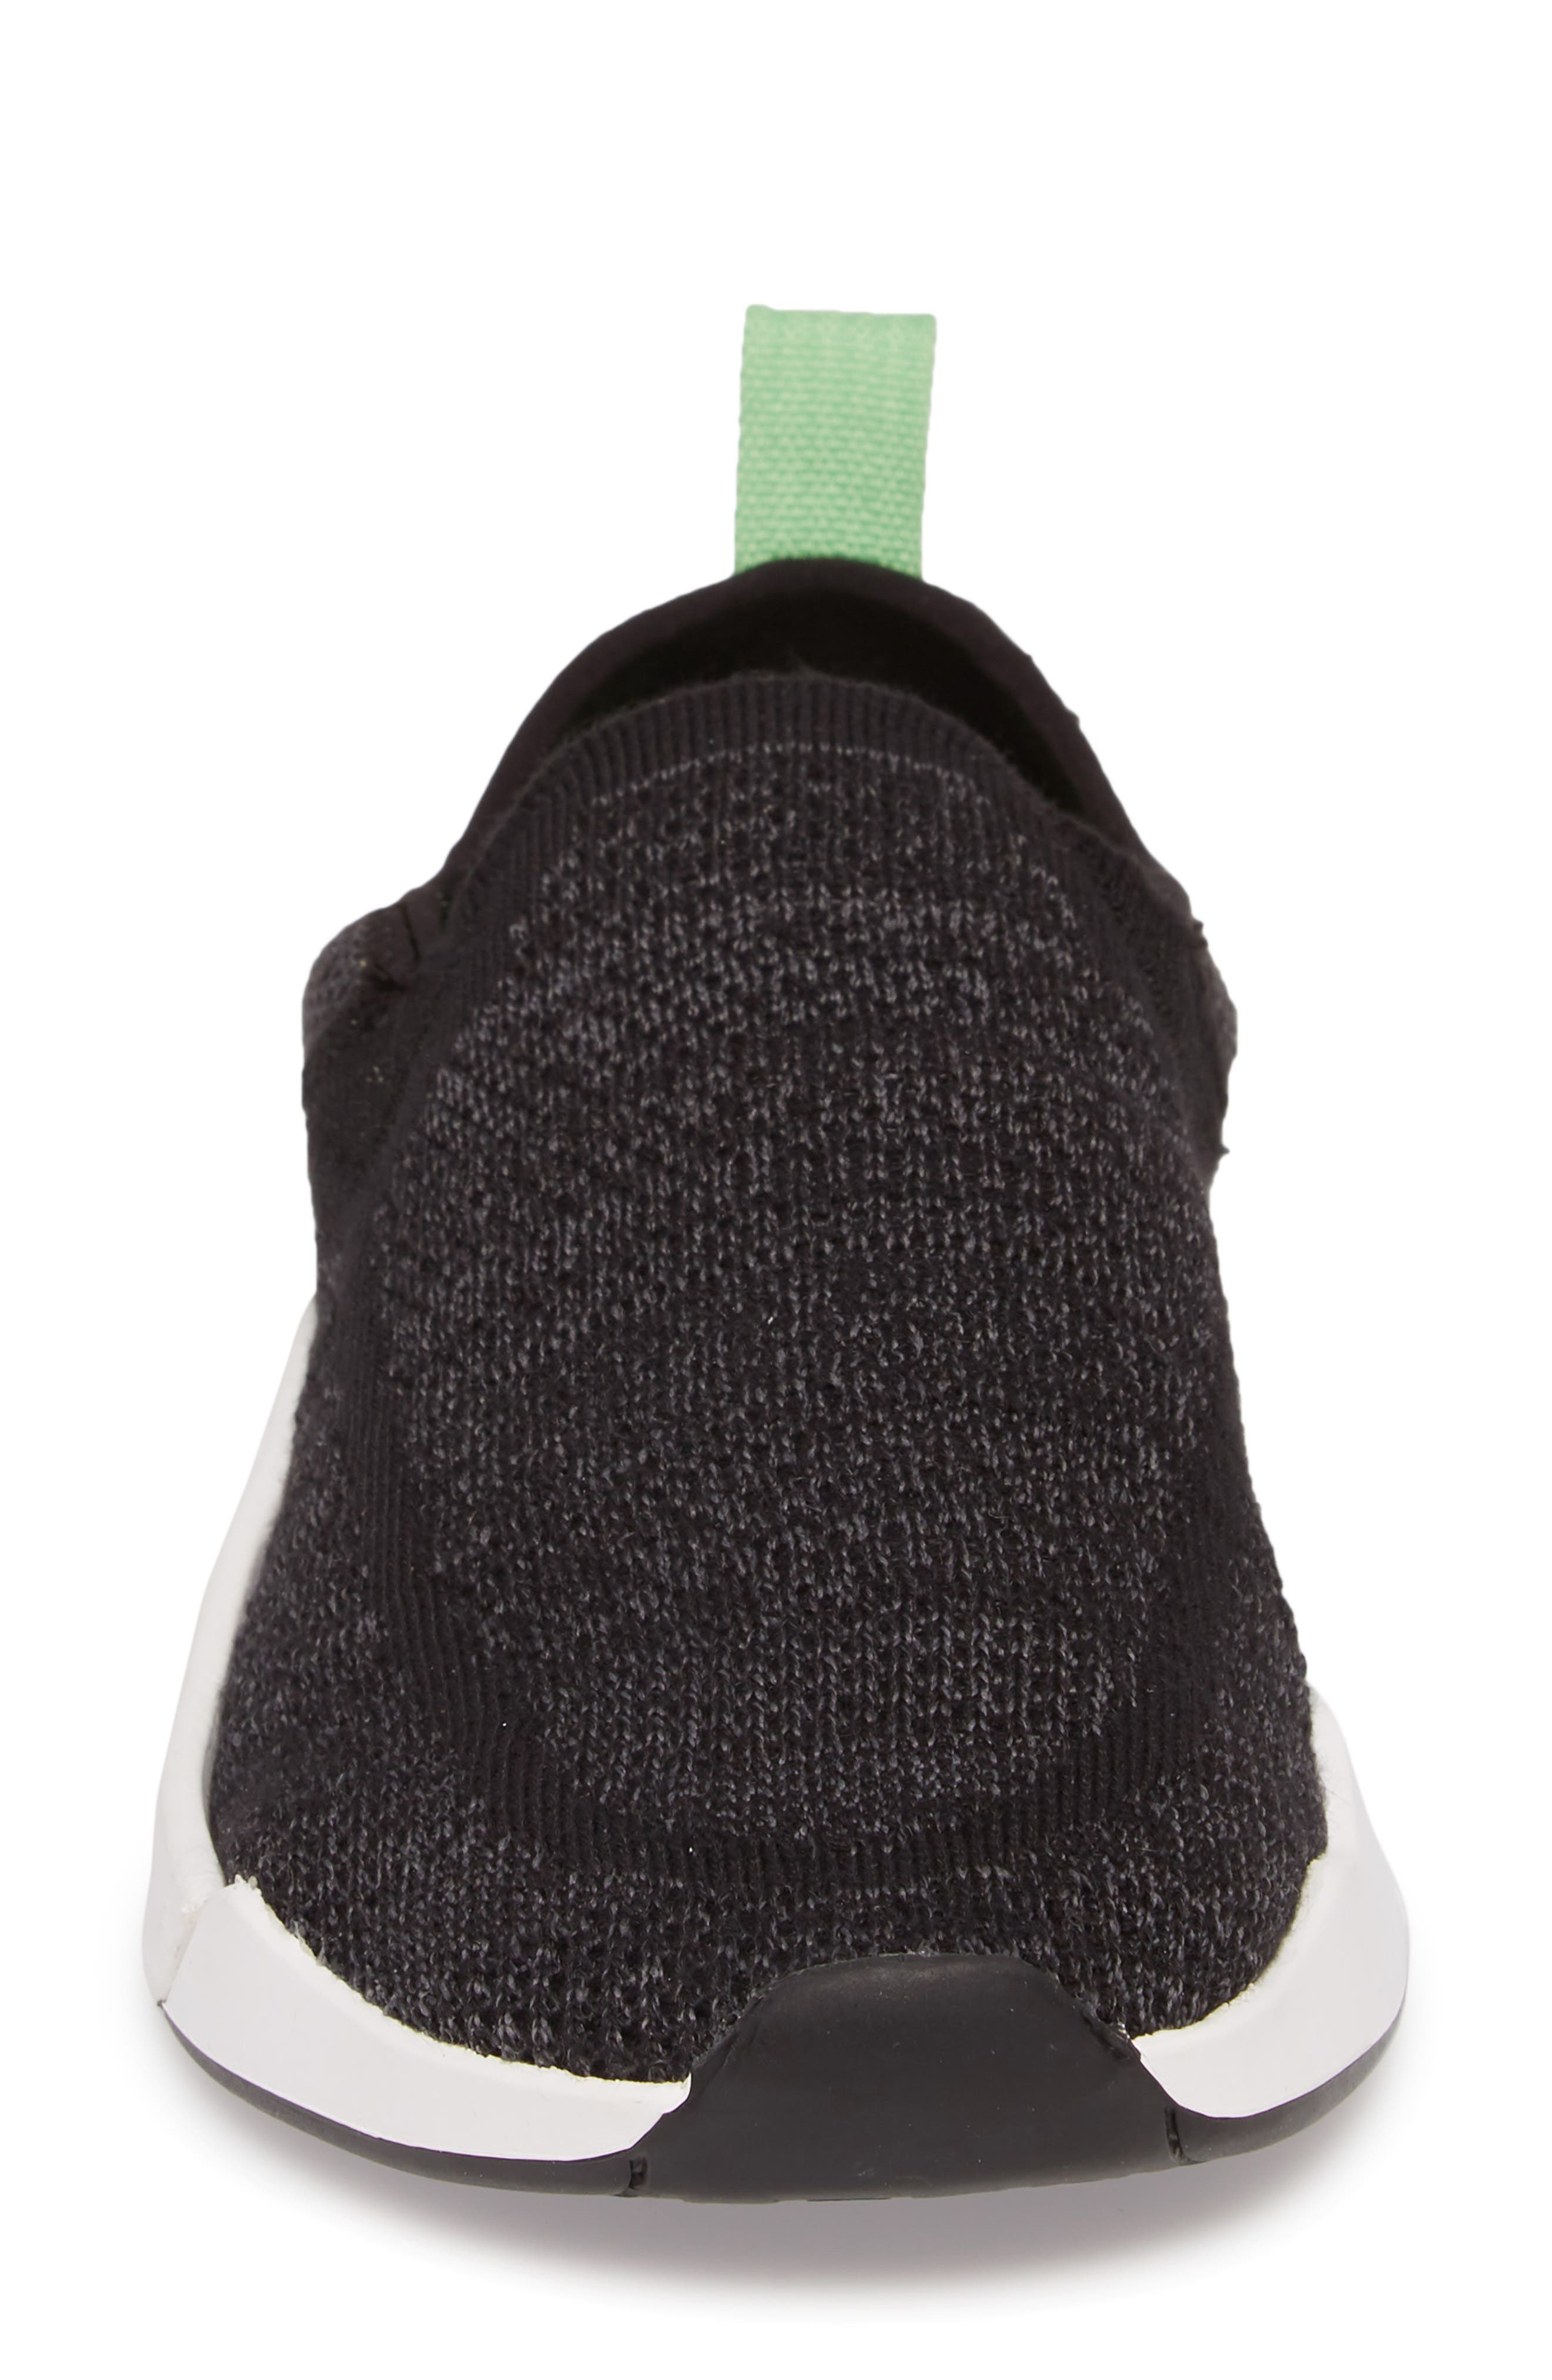 Chiba Quest Knit Slip-On Sneaker,                             Alternate thumbnail 4, color,                             Black